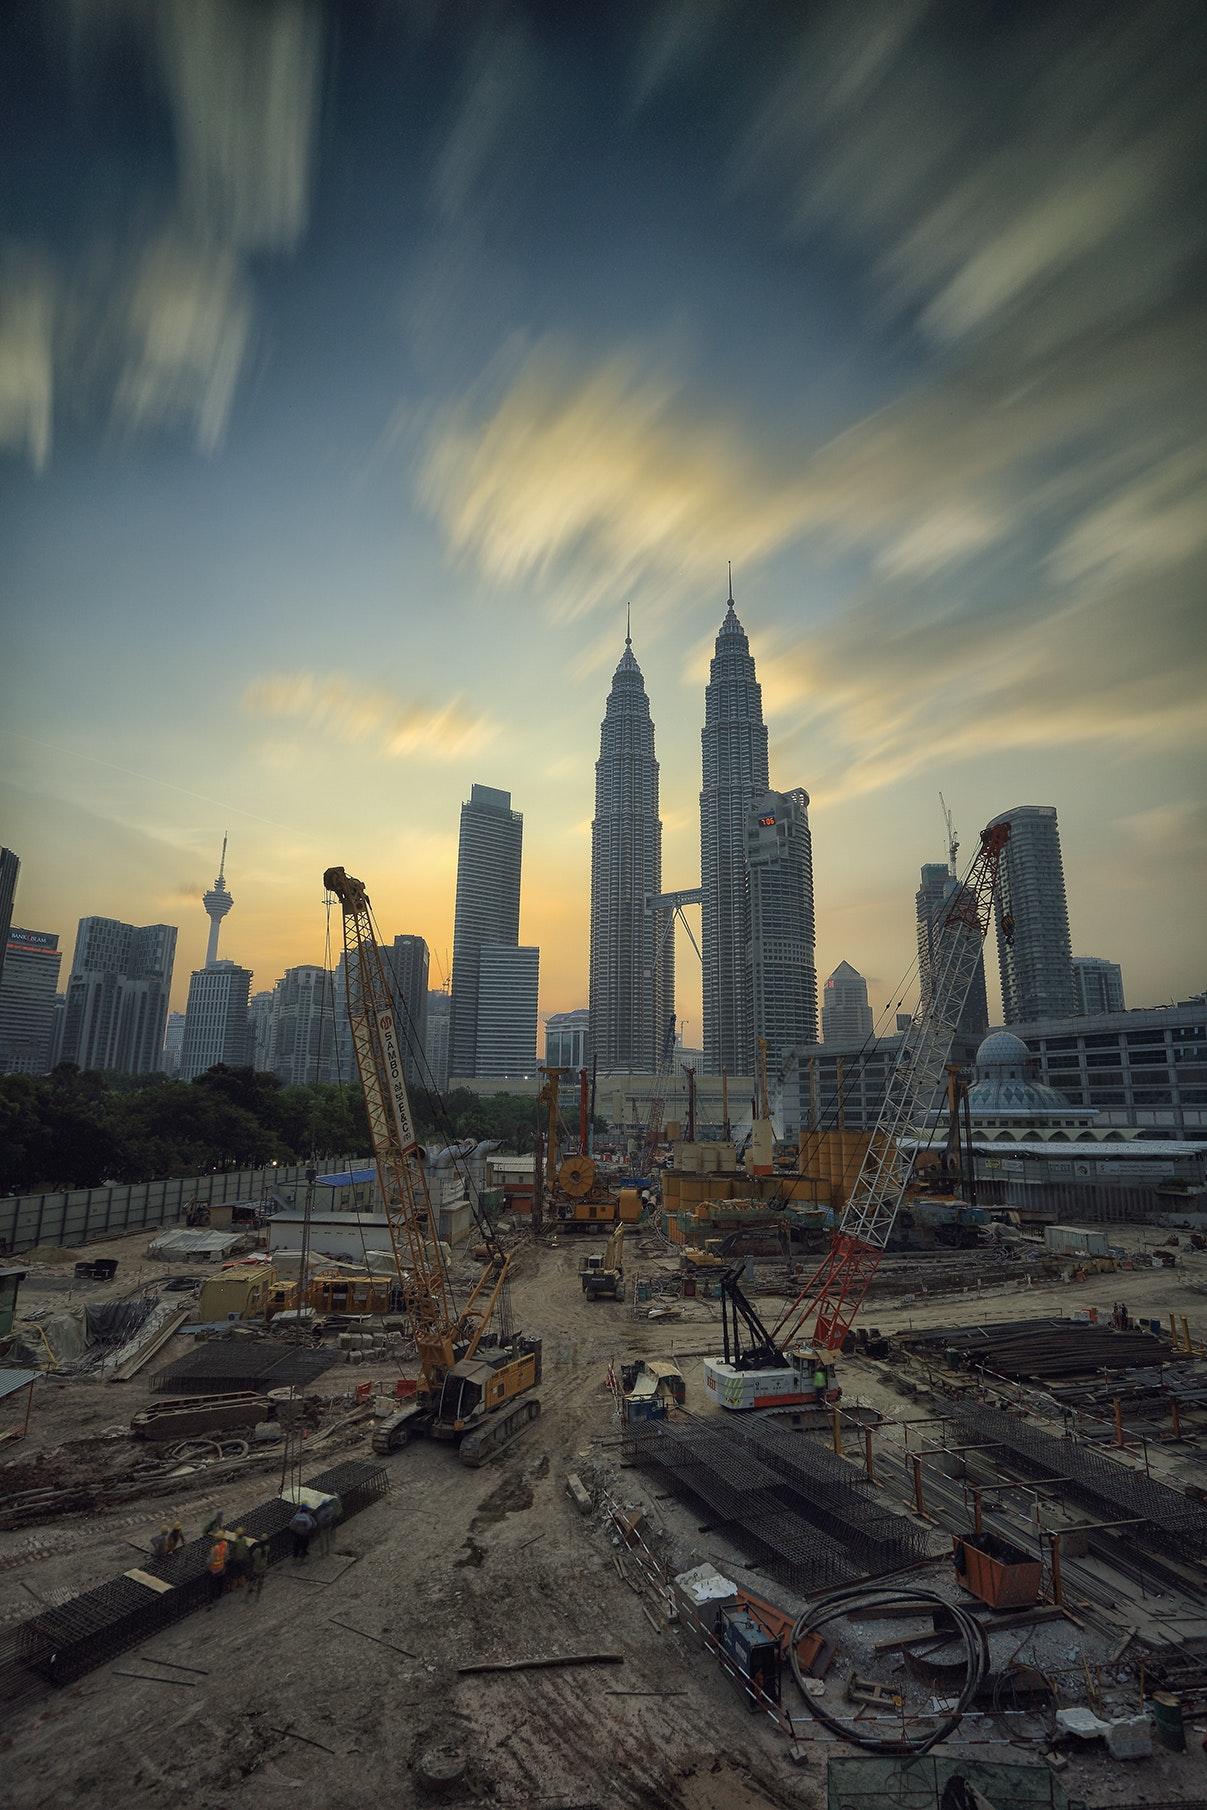 Yellow Tower Crane, Progress, Petronas twin towers, Outdoors, Shopping, HQ Photo